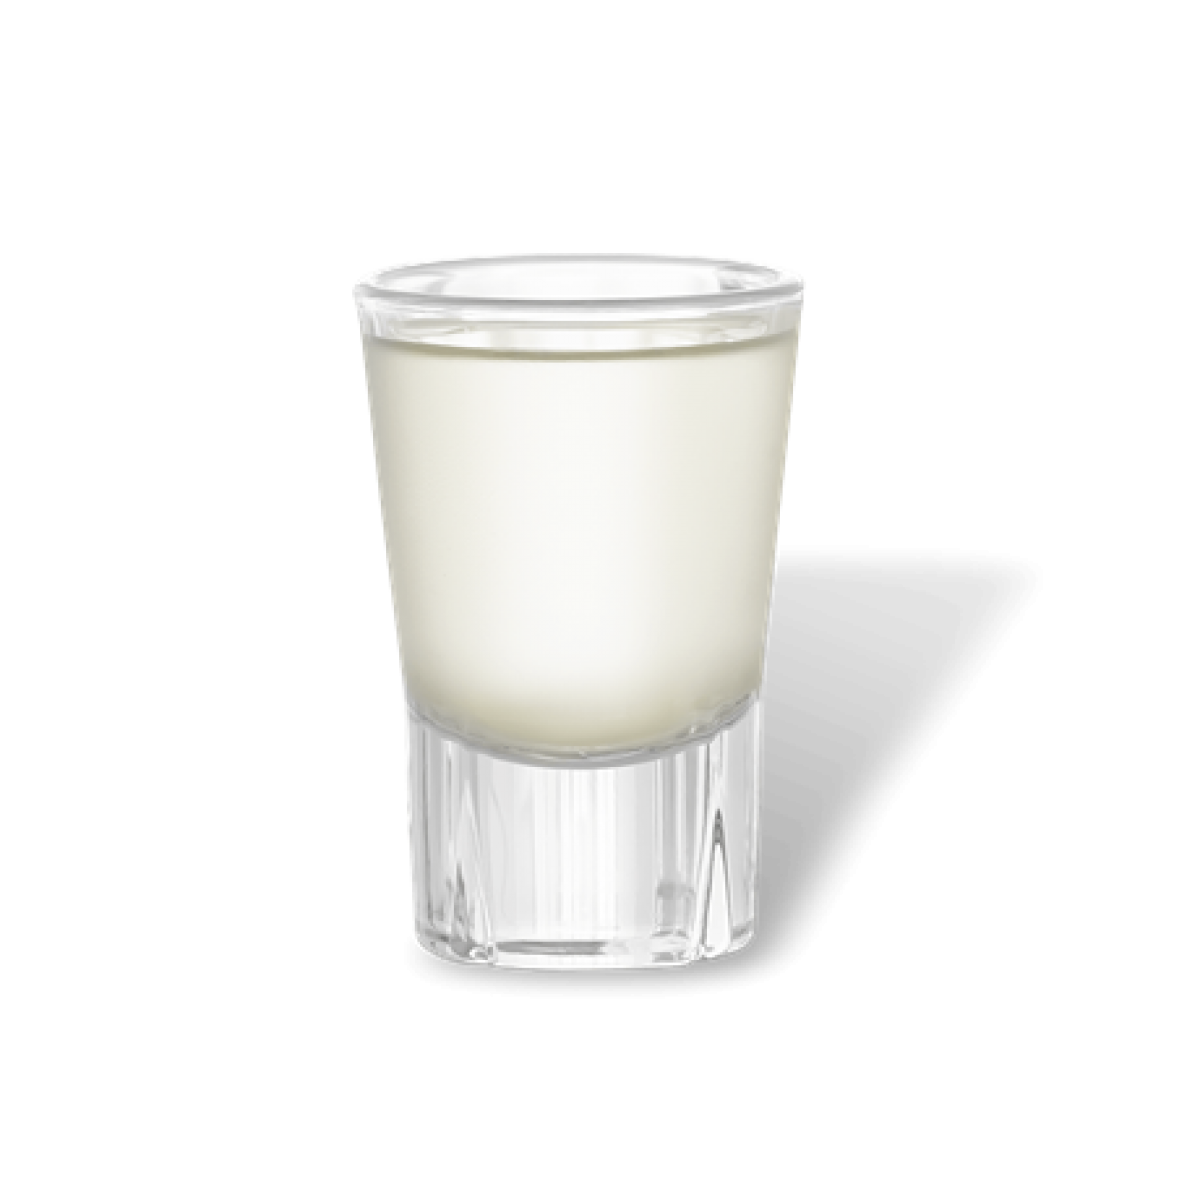 ROSENDAHL Grand Cru snapseglas 6 stk. 4 cl.